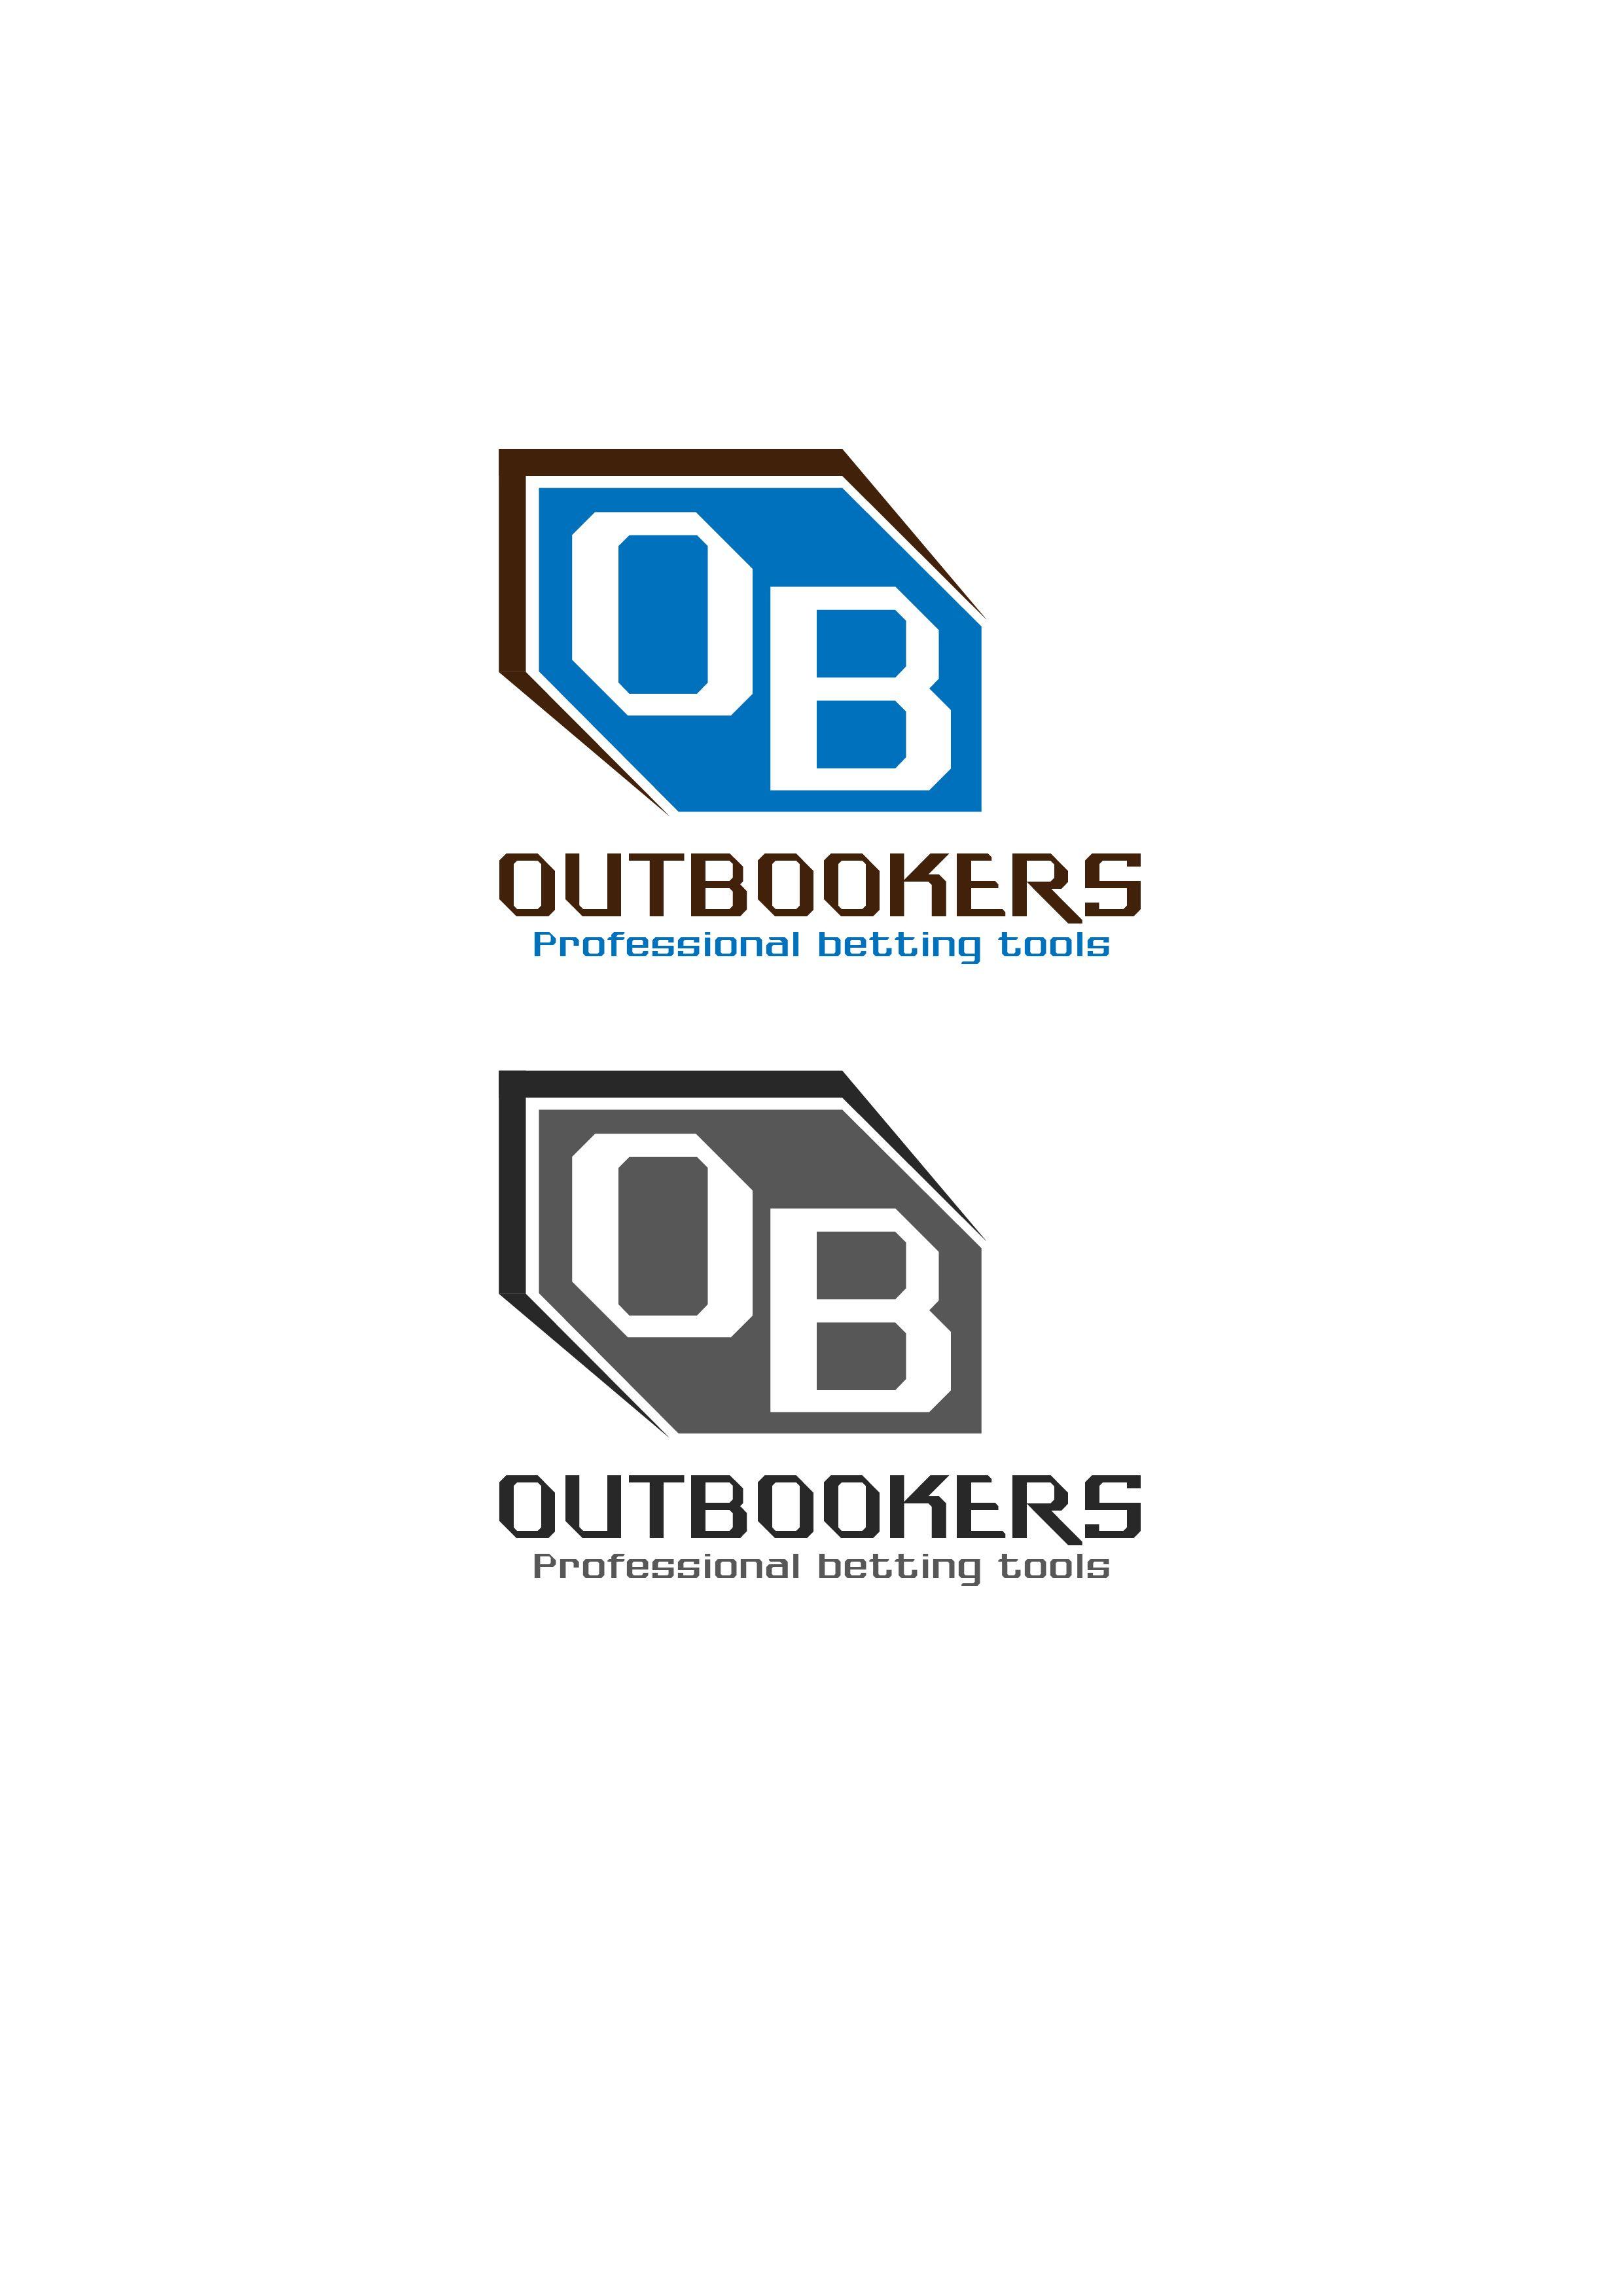 Логотип для компании (спортивная аналитика) - дизайнер Wou1ter